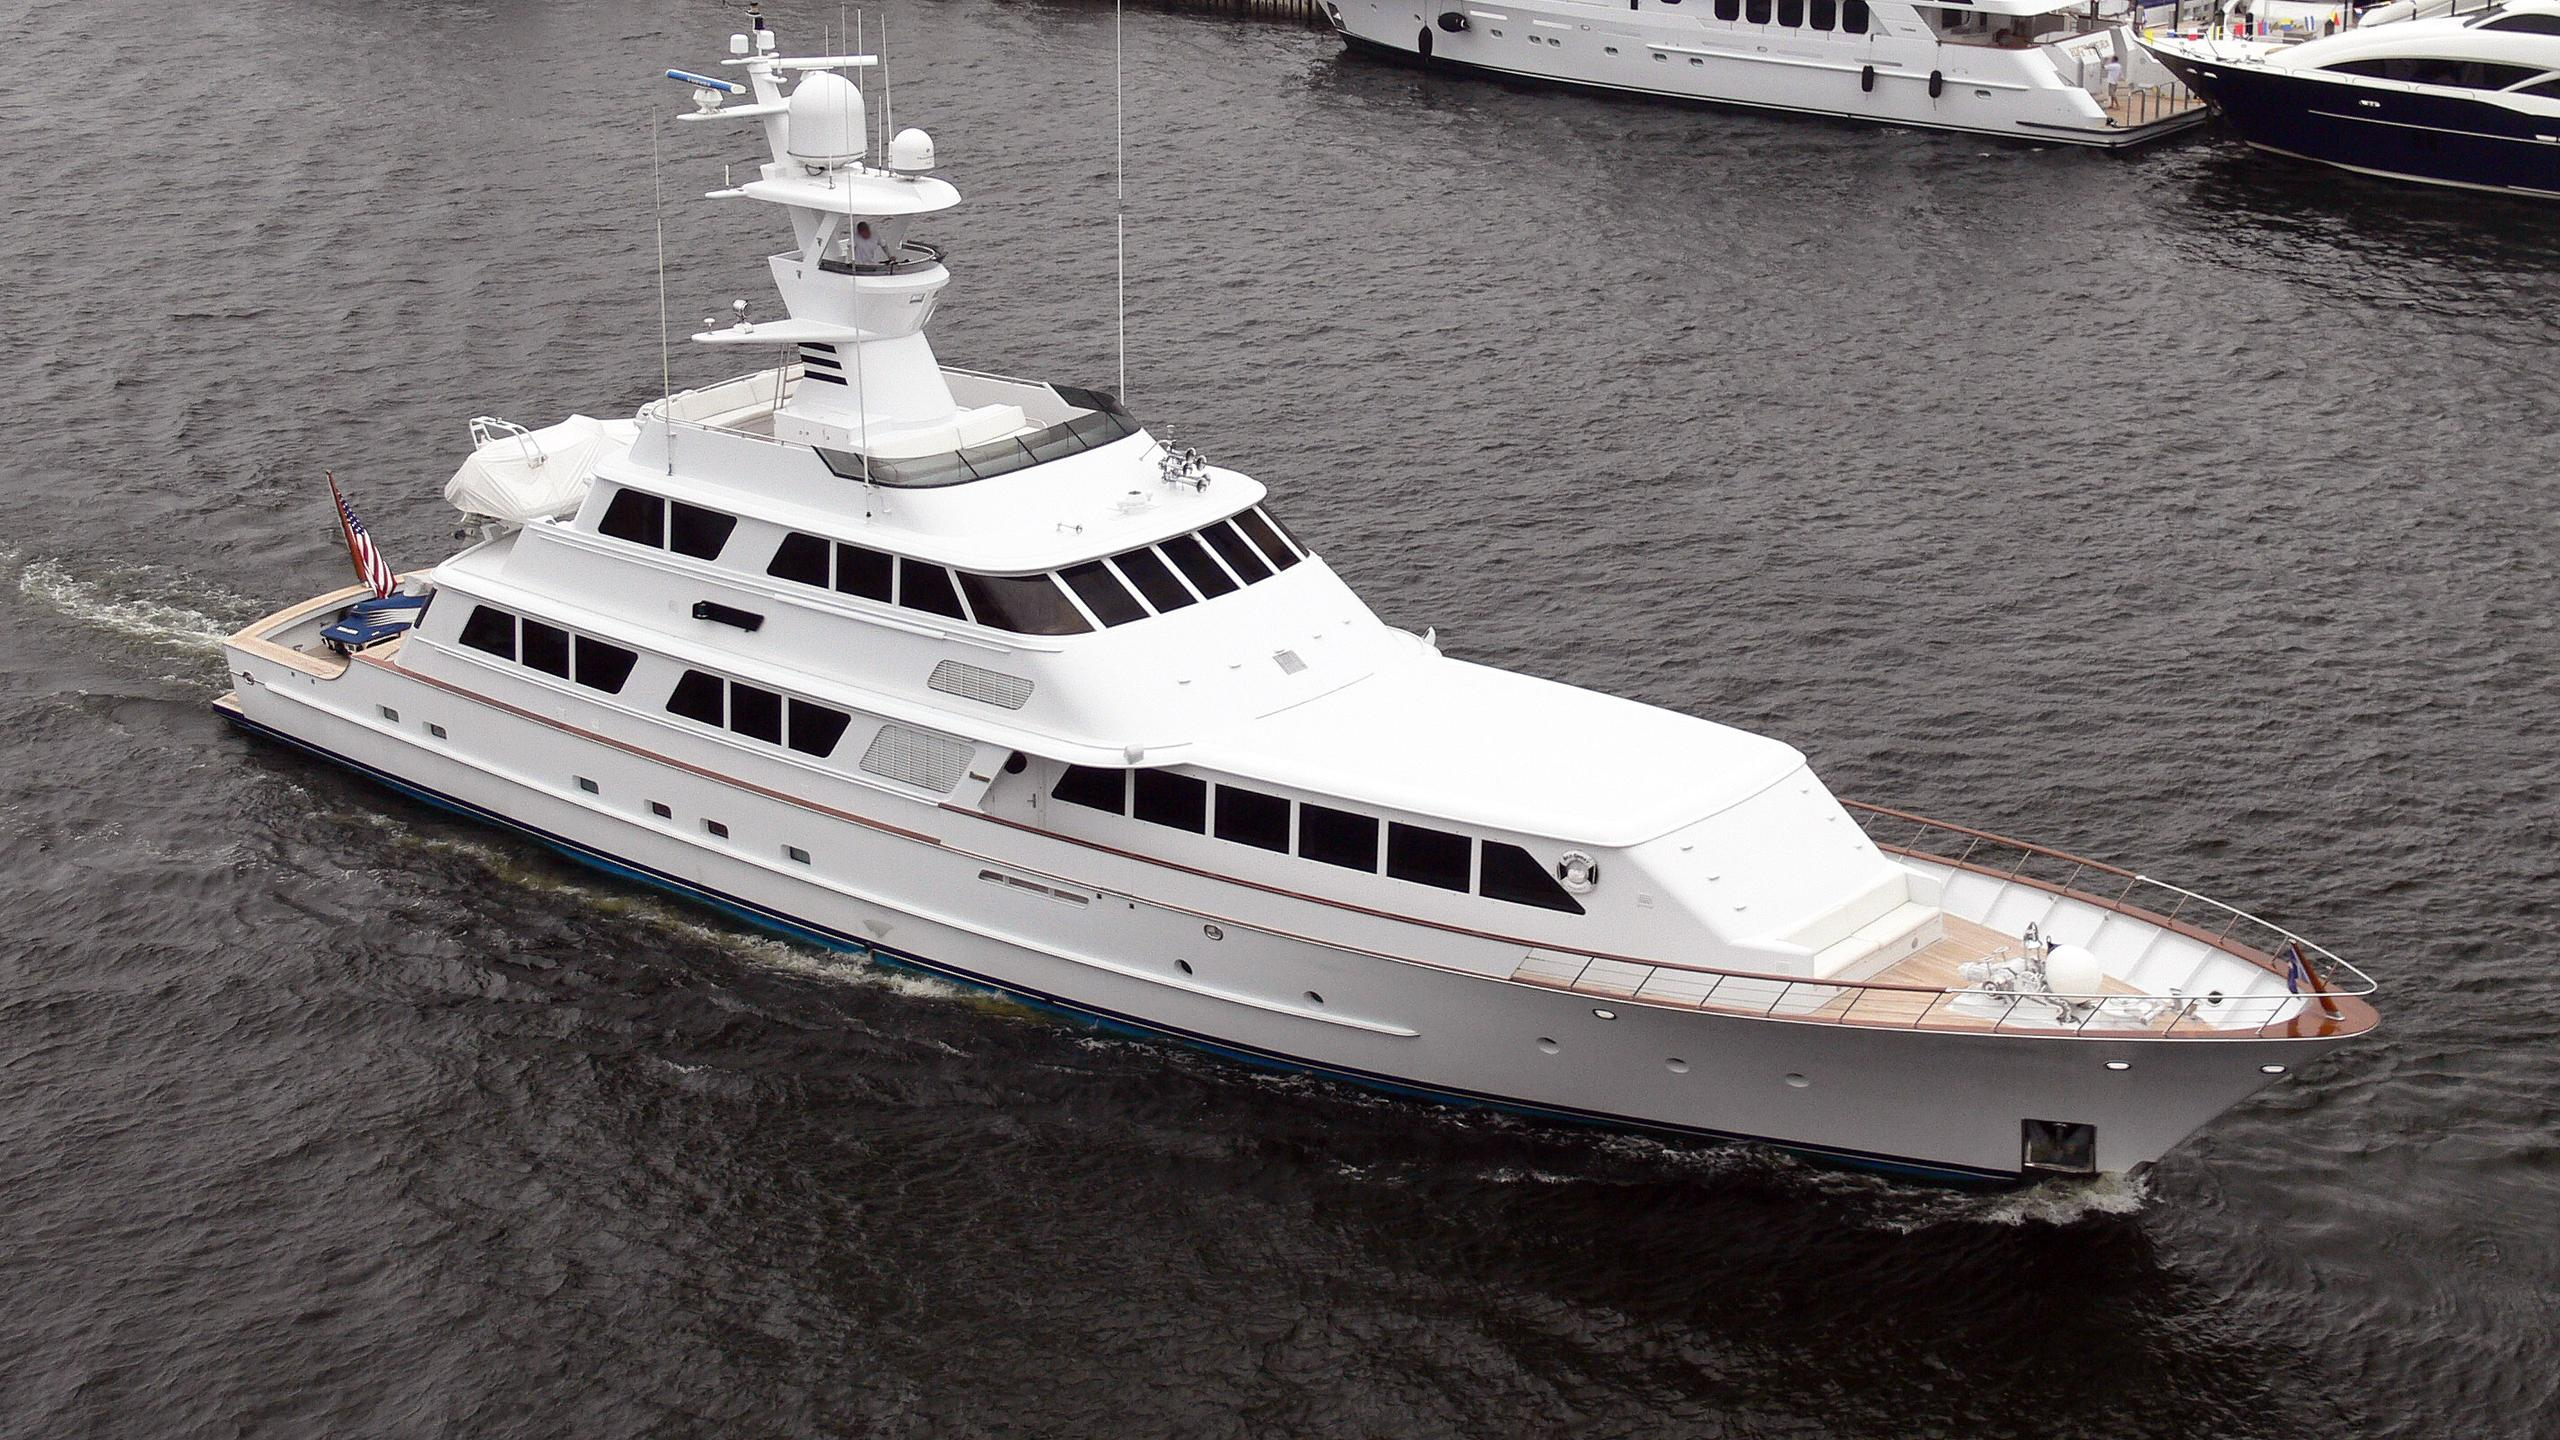 lady-sandals-motor-yacht-feadship-1985-40m-running-half-profile